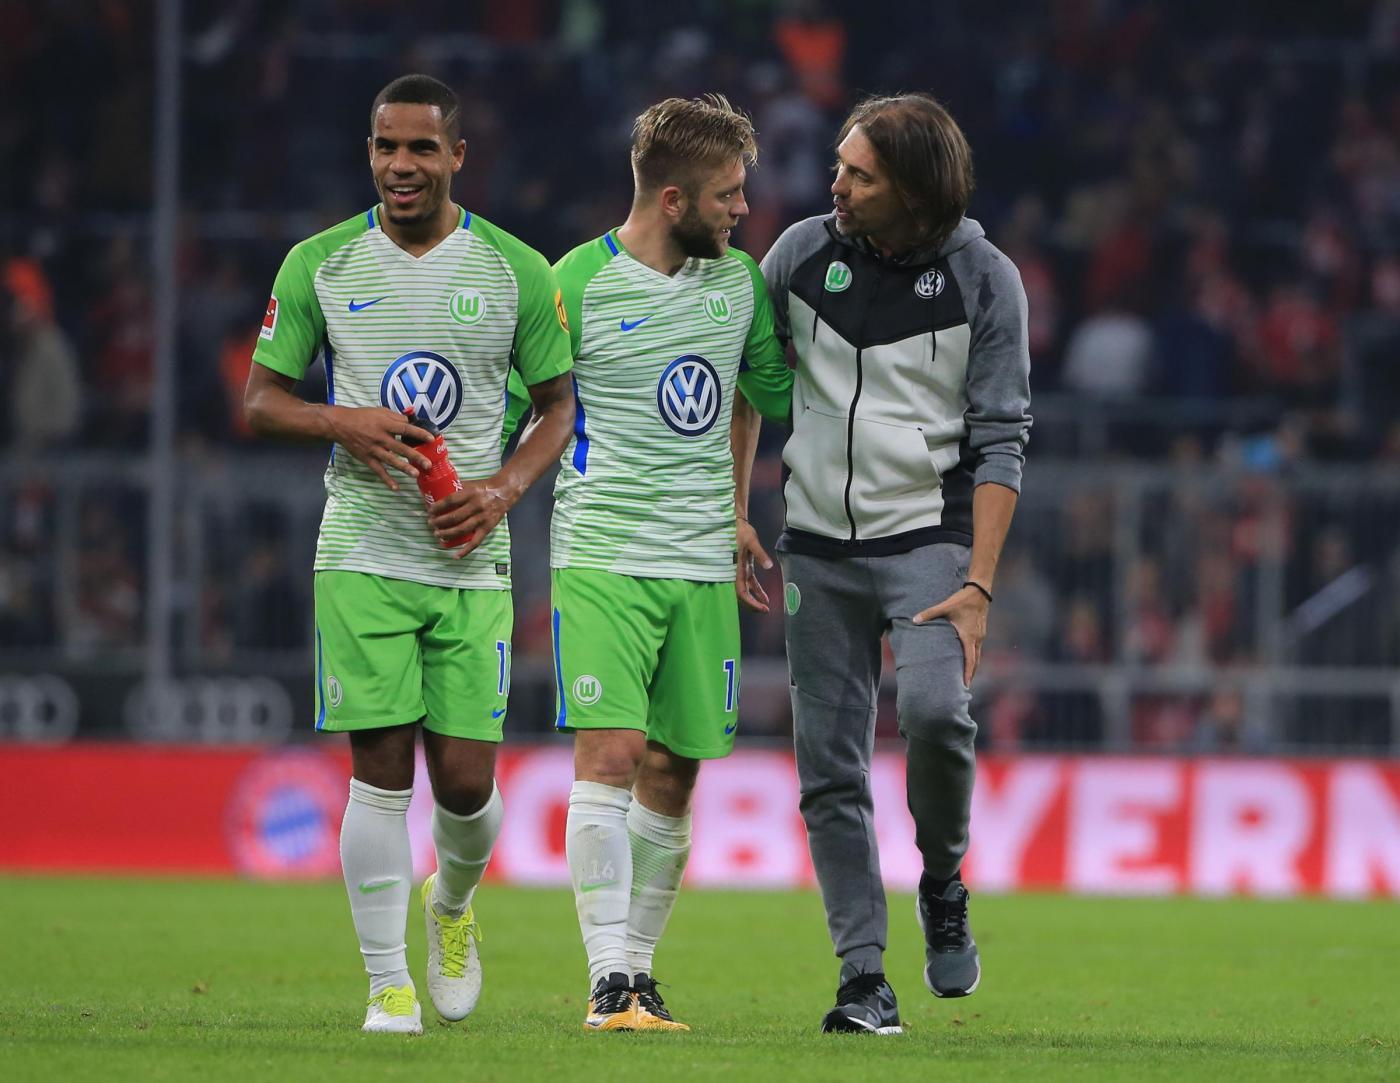 Pronostico Oleksandriya-Wolfsburg 28 novembre: quote Europa League